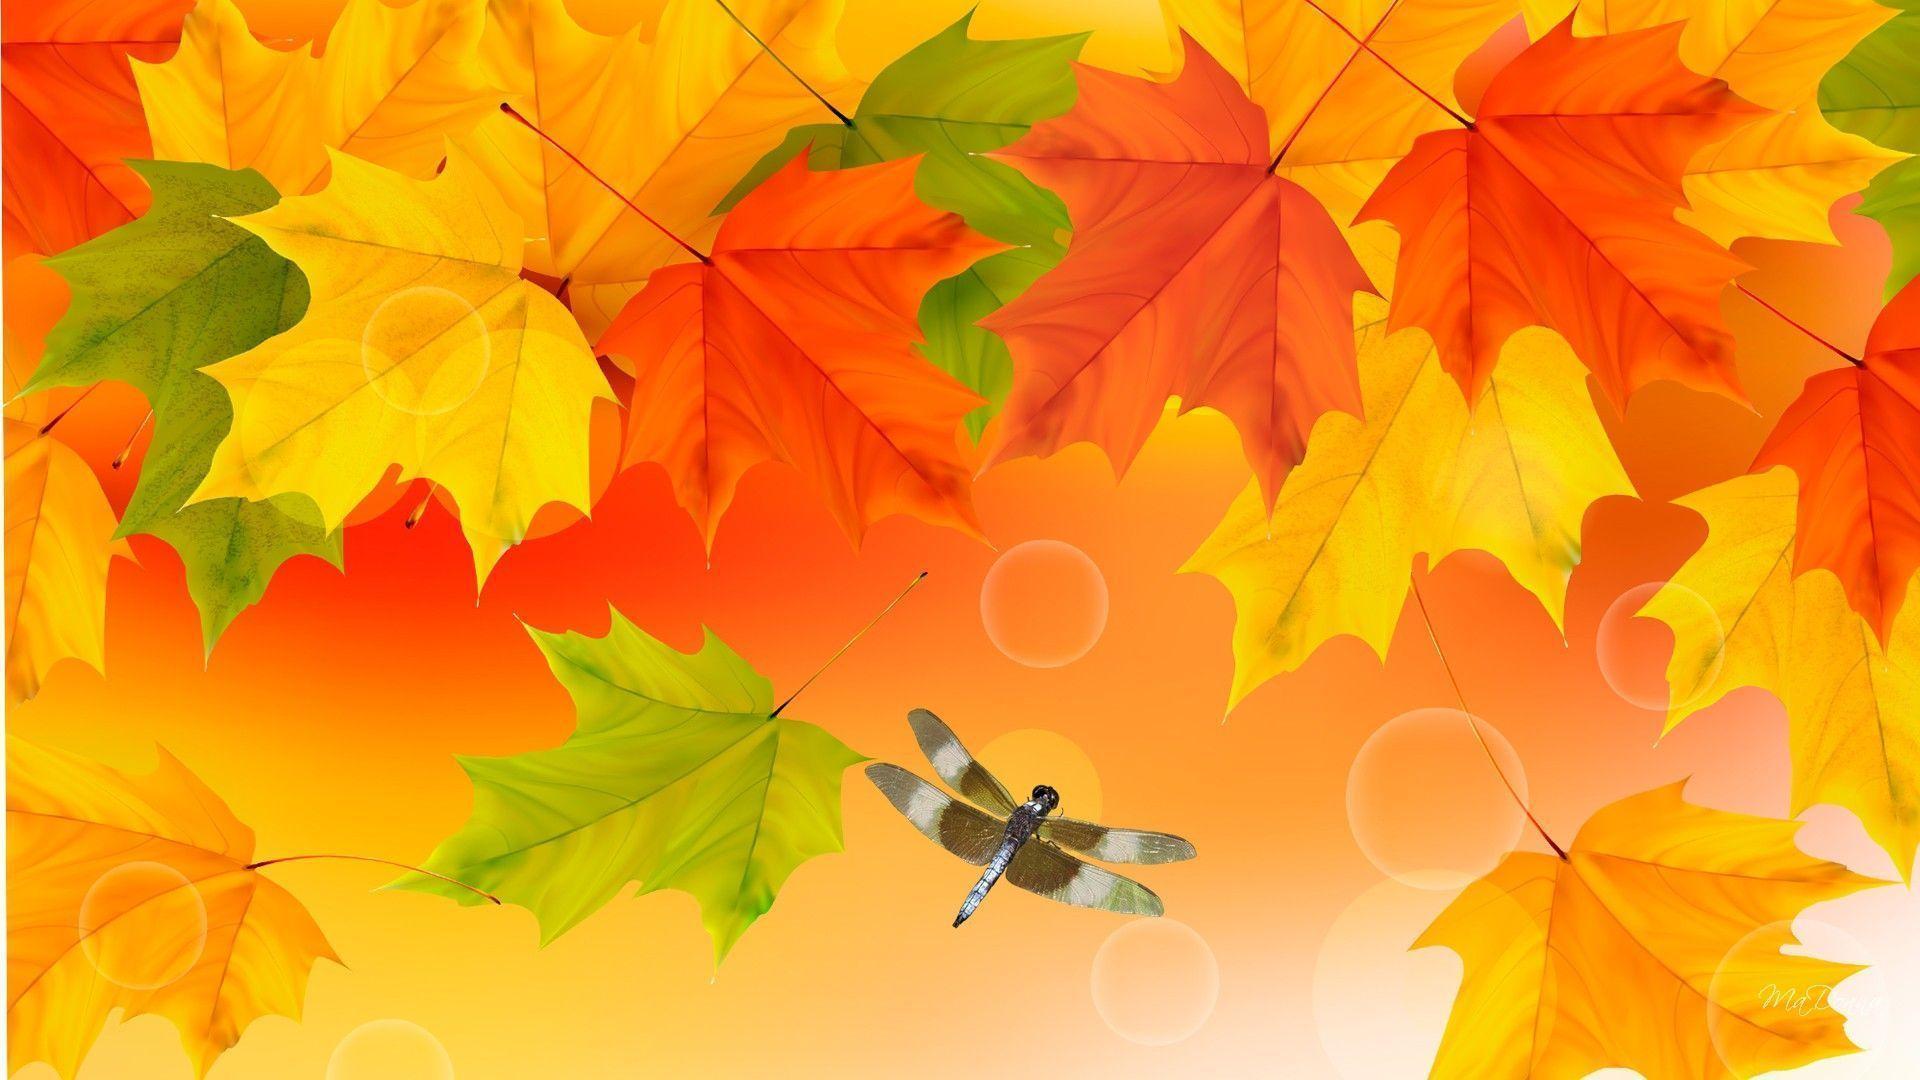 Fall Colors Wallpaper Backgrounds - Wallpaper Cave